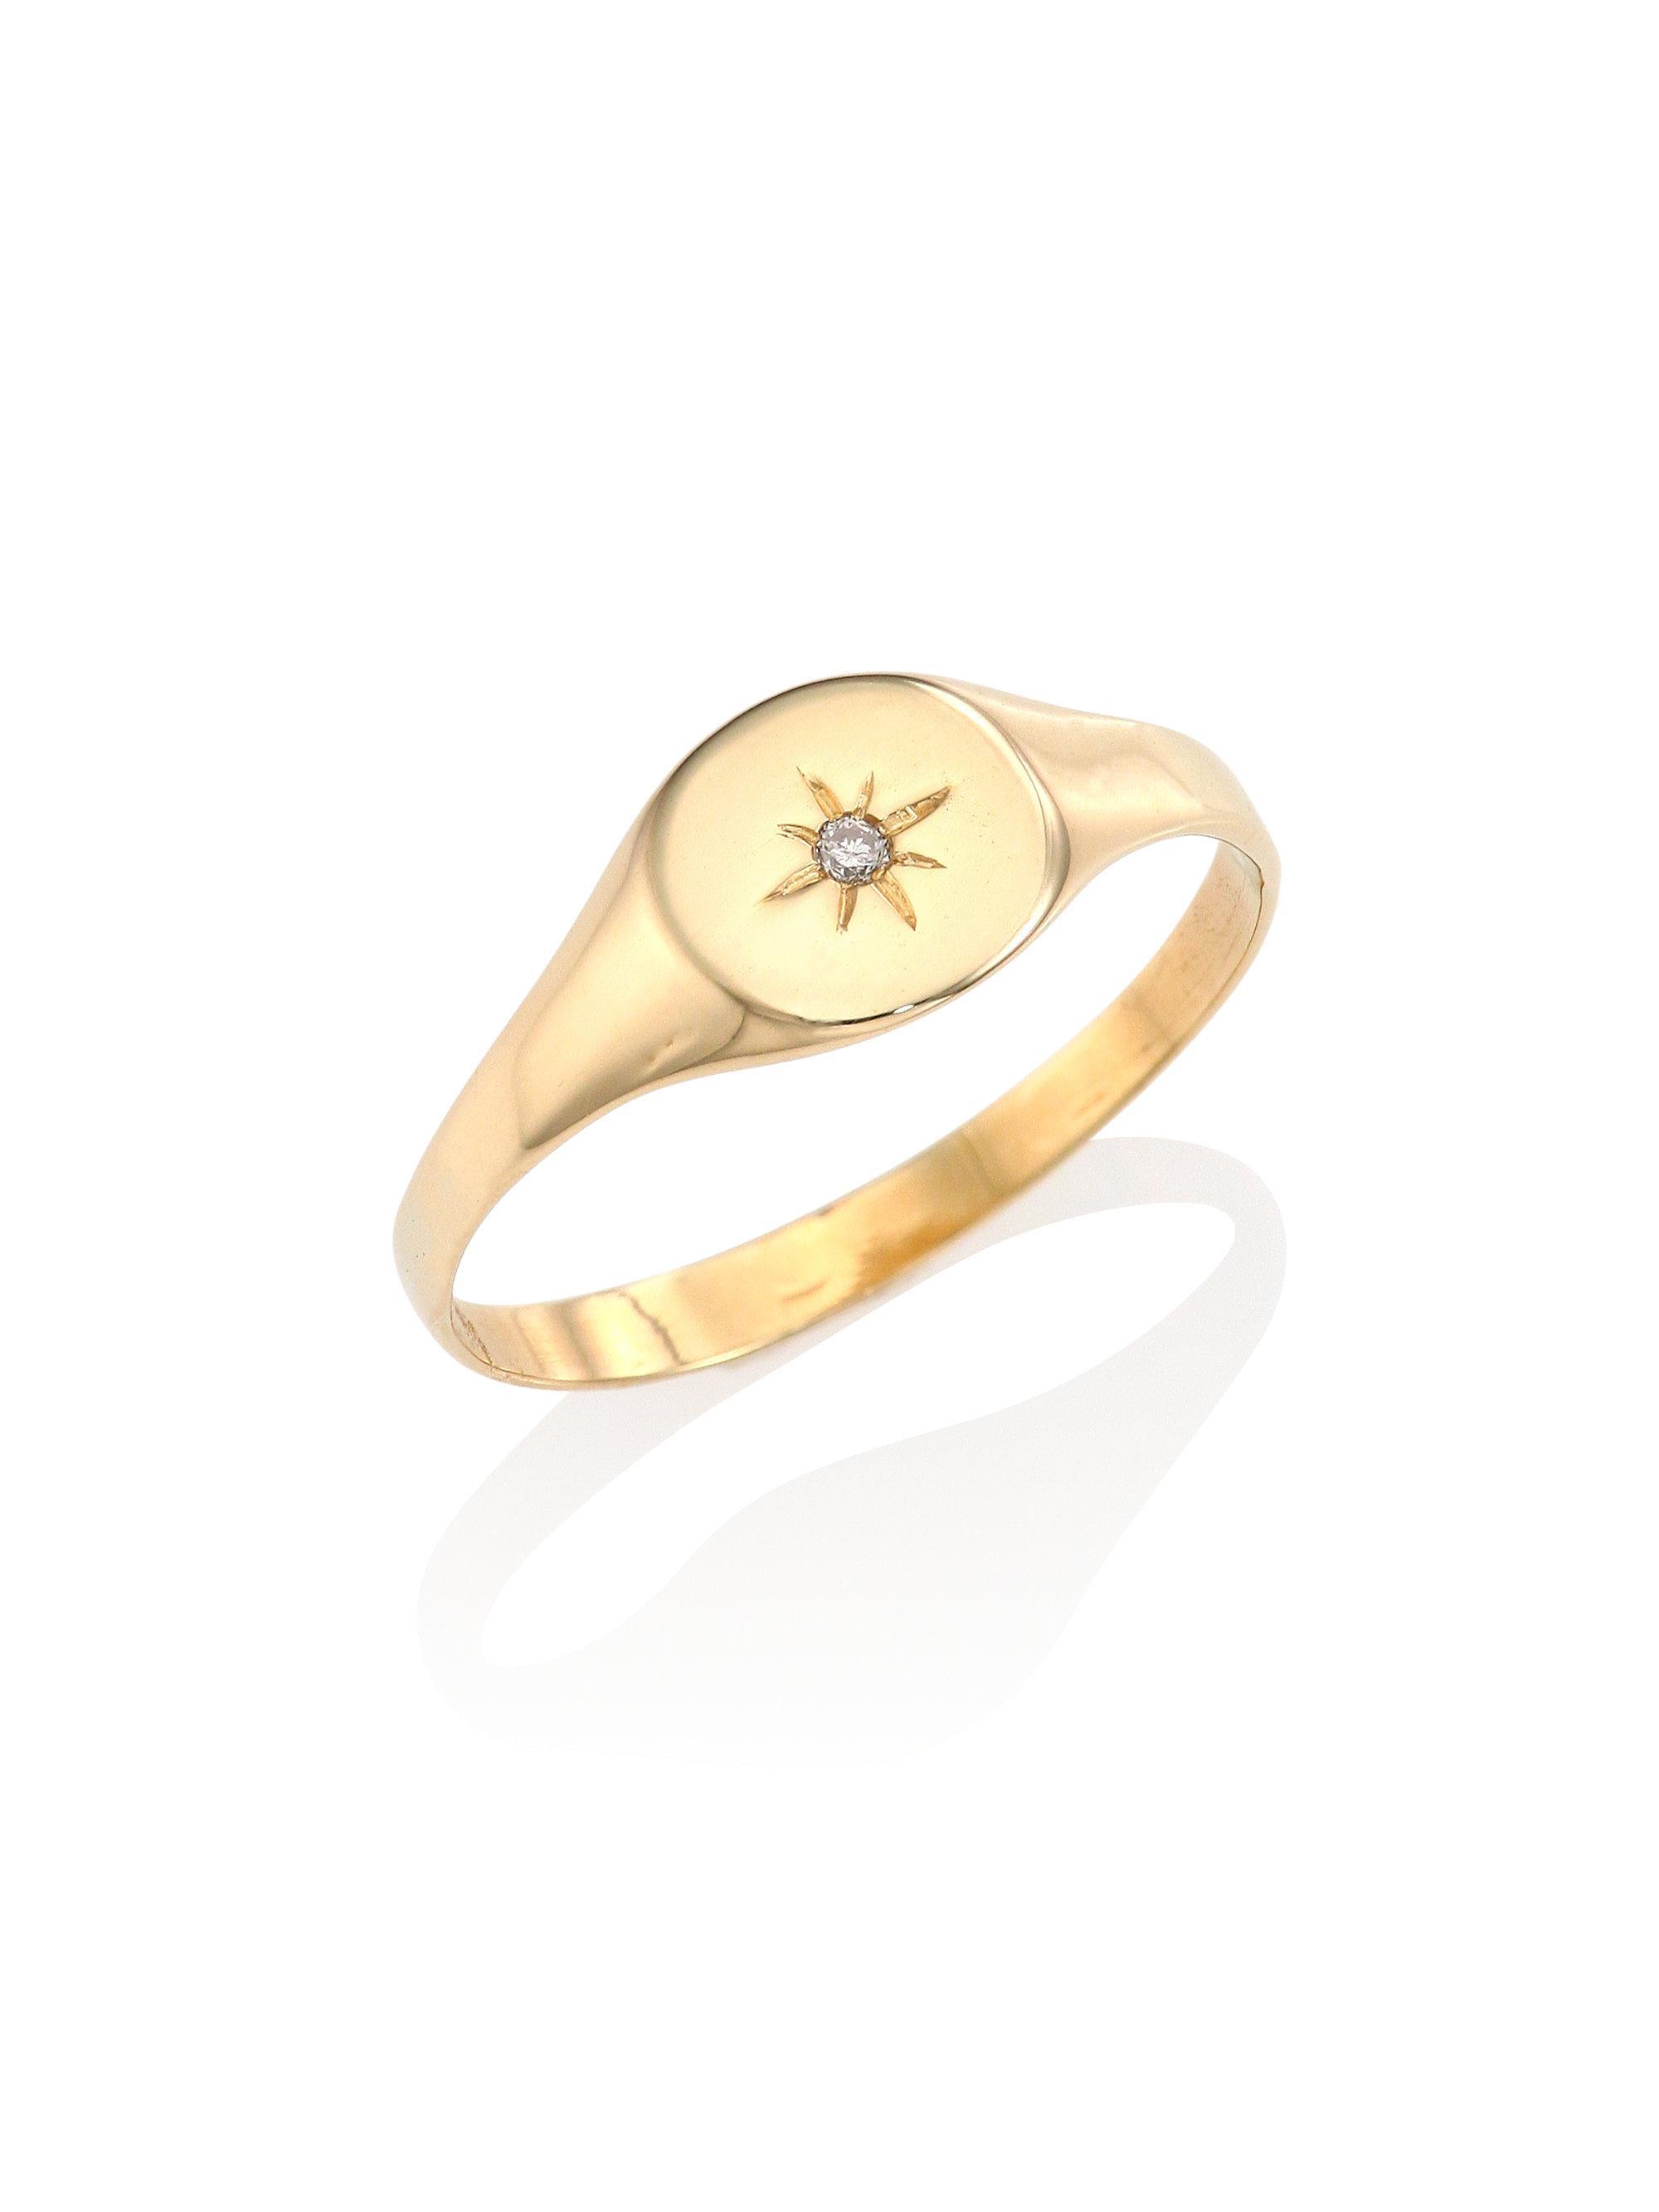 Jacquie Aiche Teardrop Crystal Signet Ring NSoInRtlfz